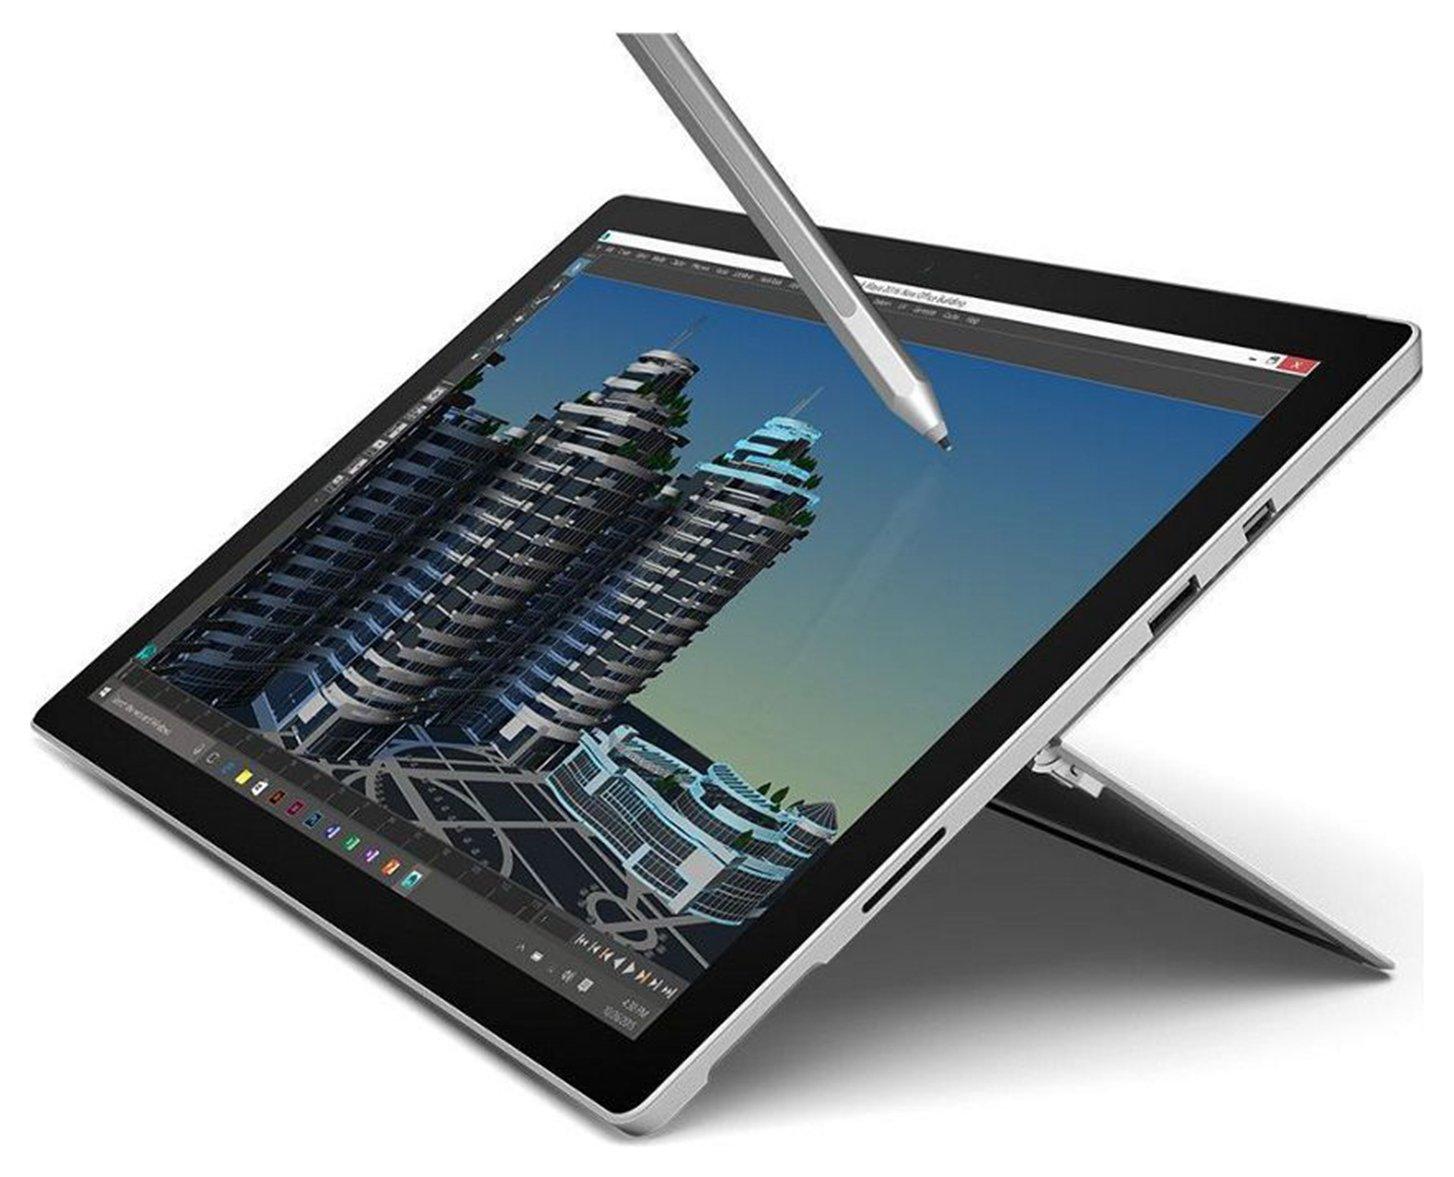 Microsoft Surface Pro 4 12.3 Inch Ci5 8GB 256GB Laptop